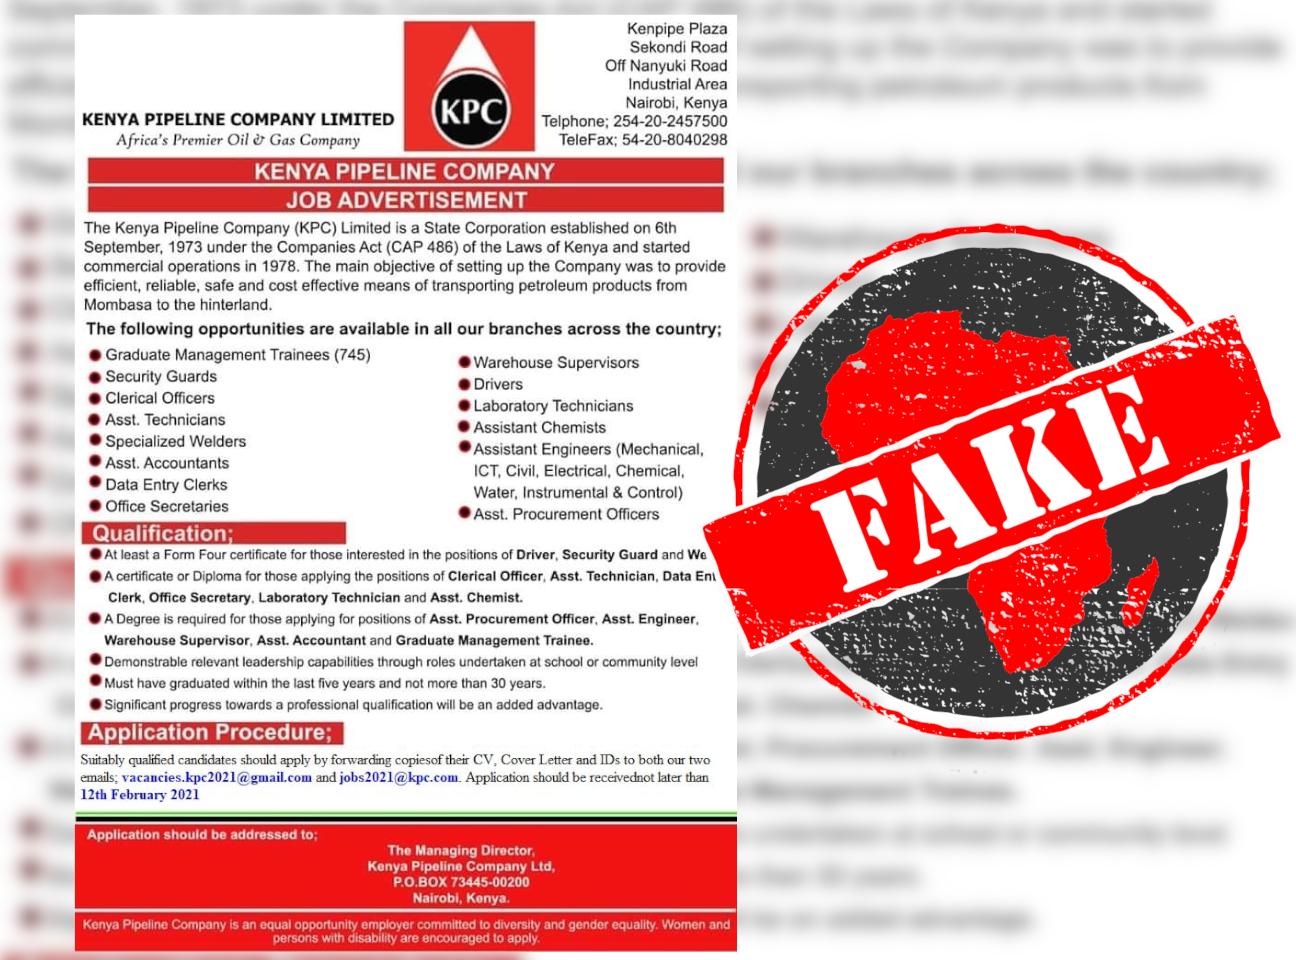 Jobscam_Fake